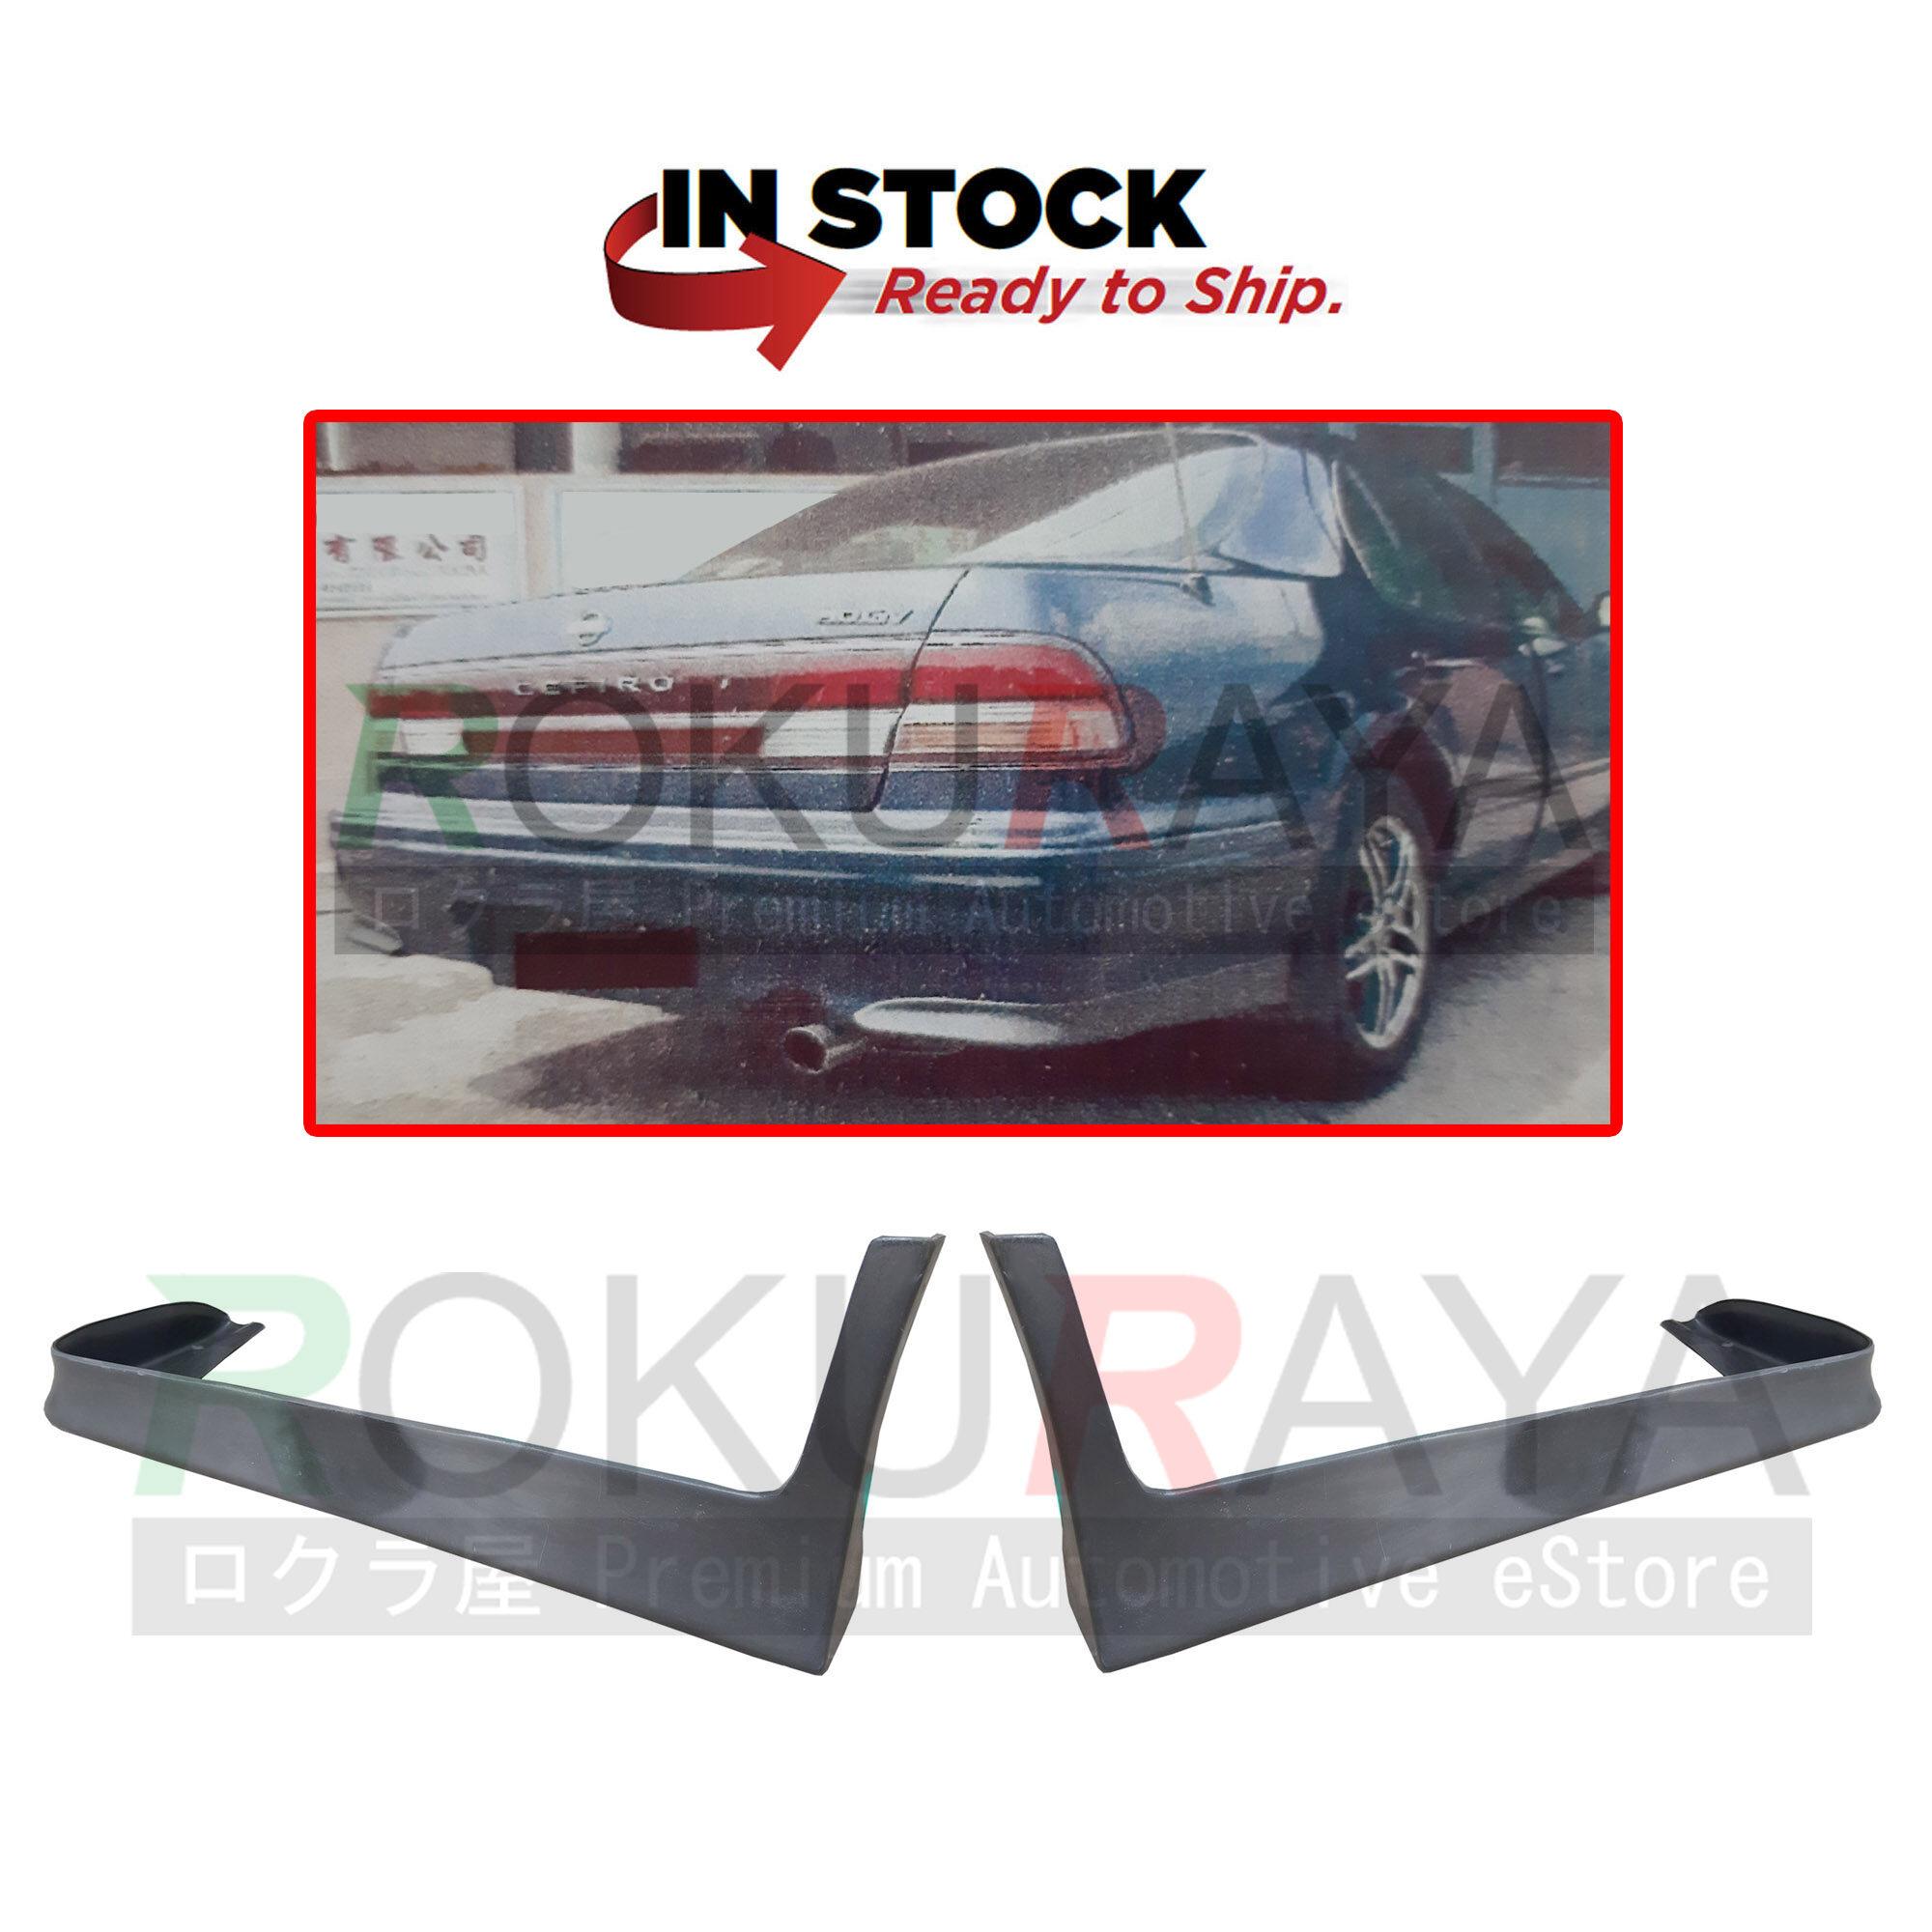 Nissan Cefiro A32 1994 1997 Rear Back Skirt Skirting Bumper Lower Lip Spoiler Polyurethane Pu Bodykit Body Kit Part Raw Material Rubber State Lazada